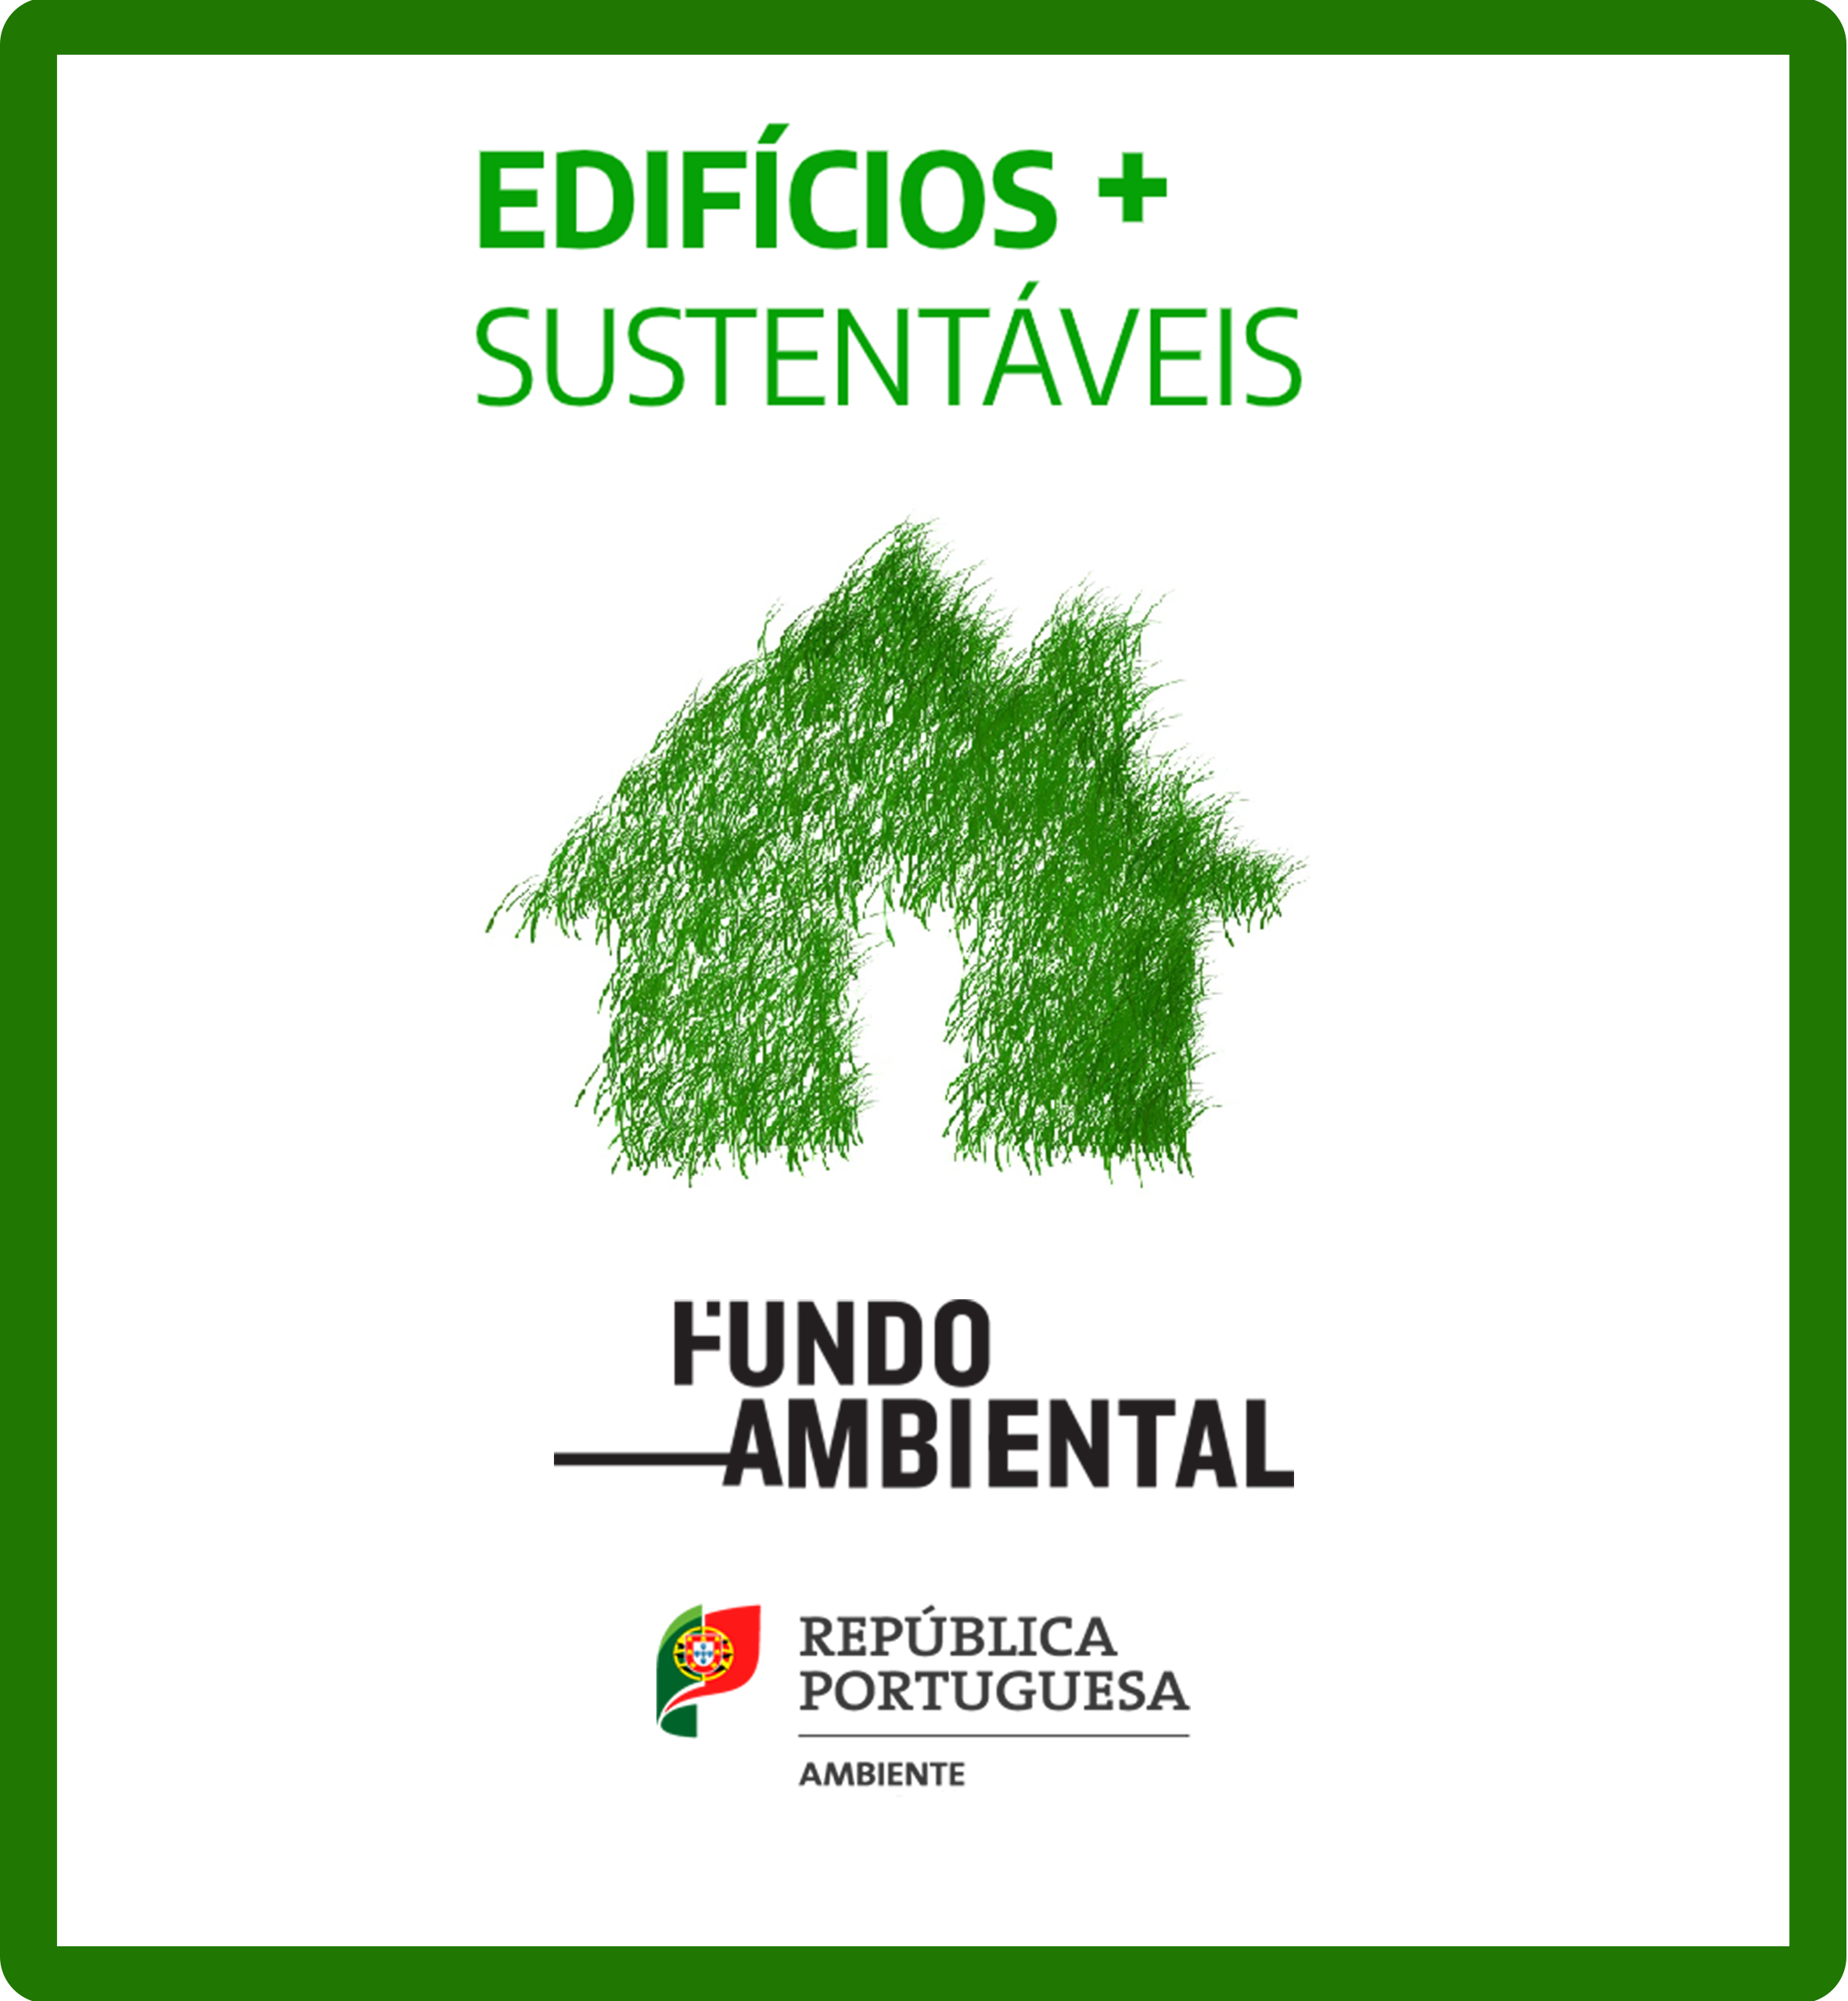 fundoambiental